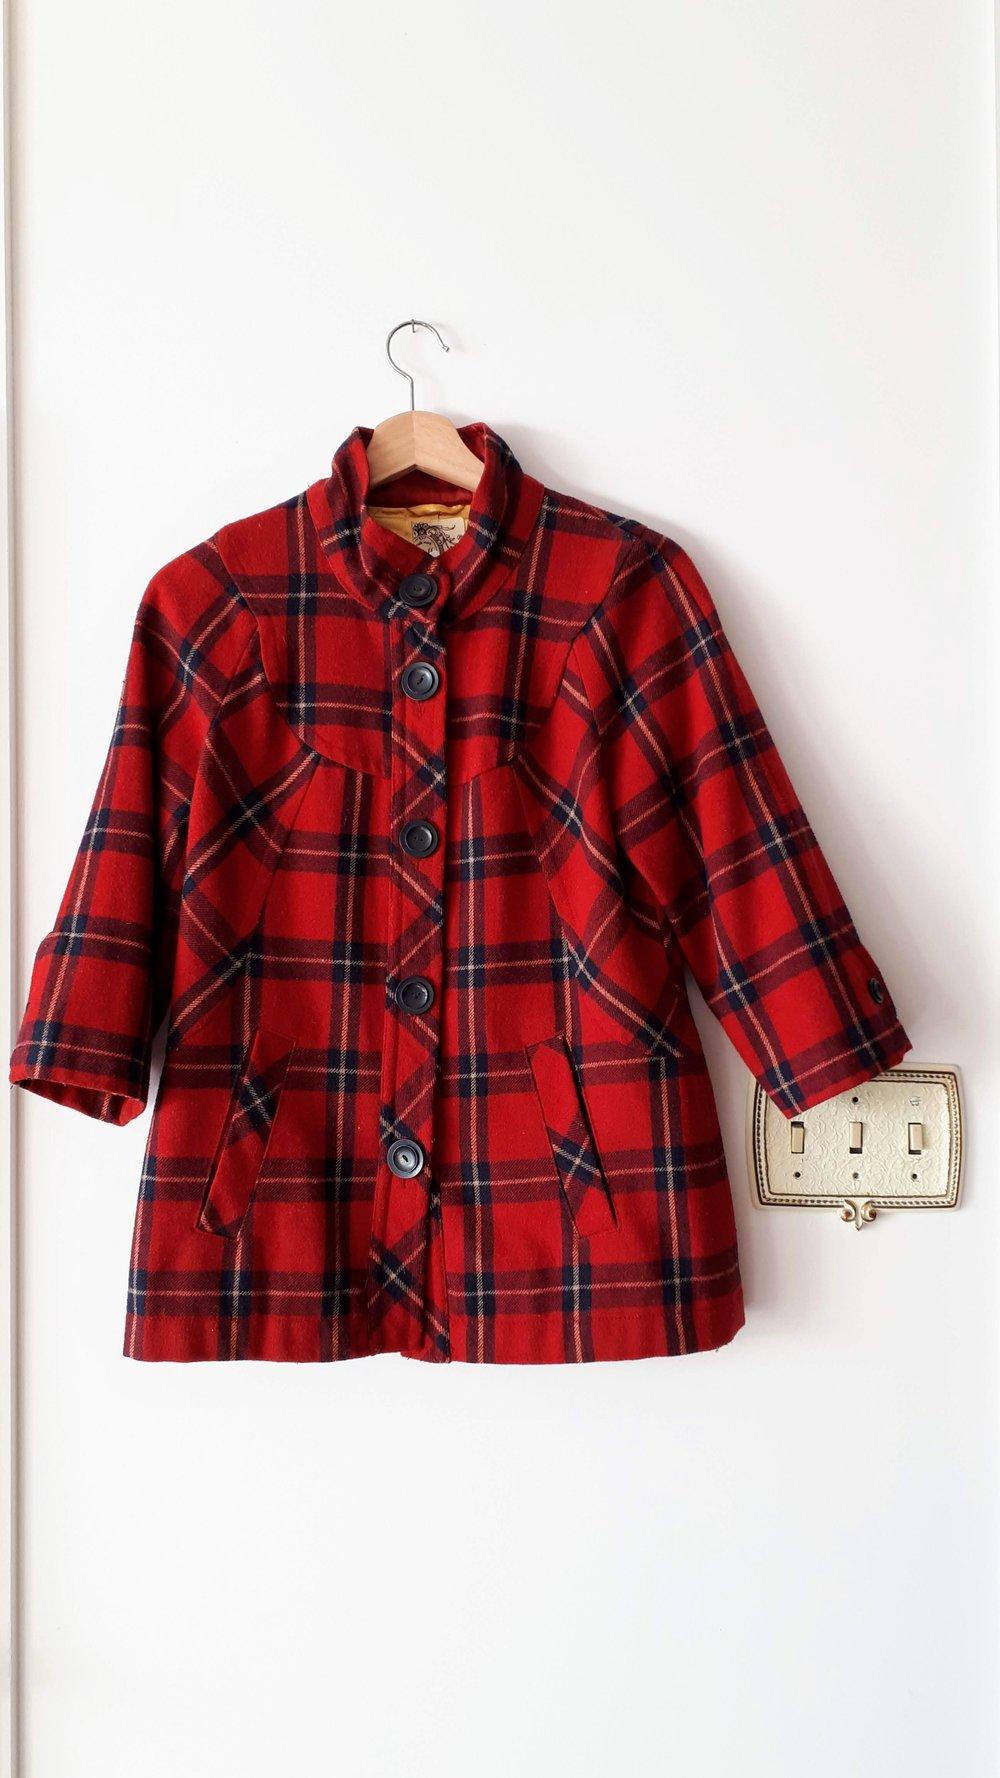 Tulle jacket; Size S, $45